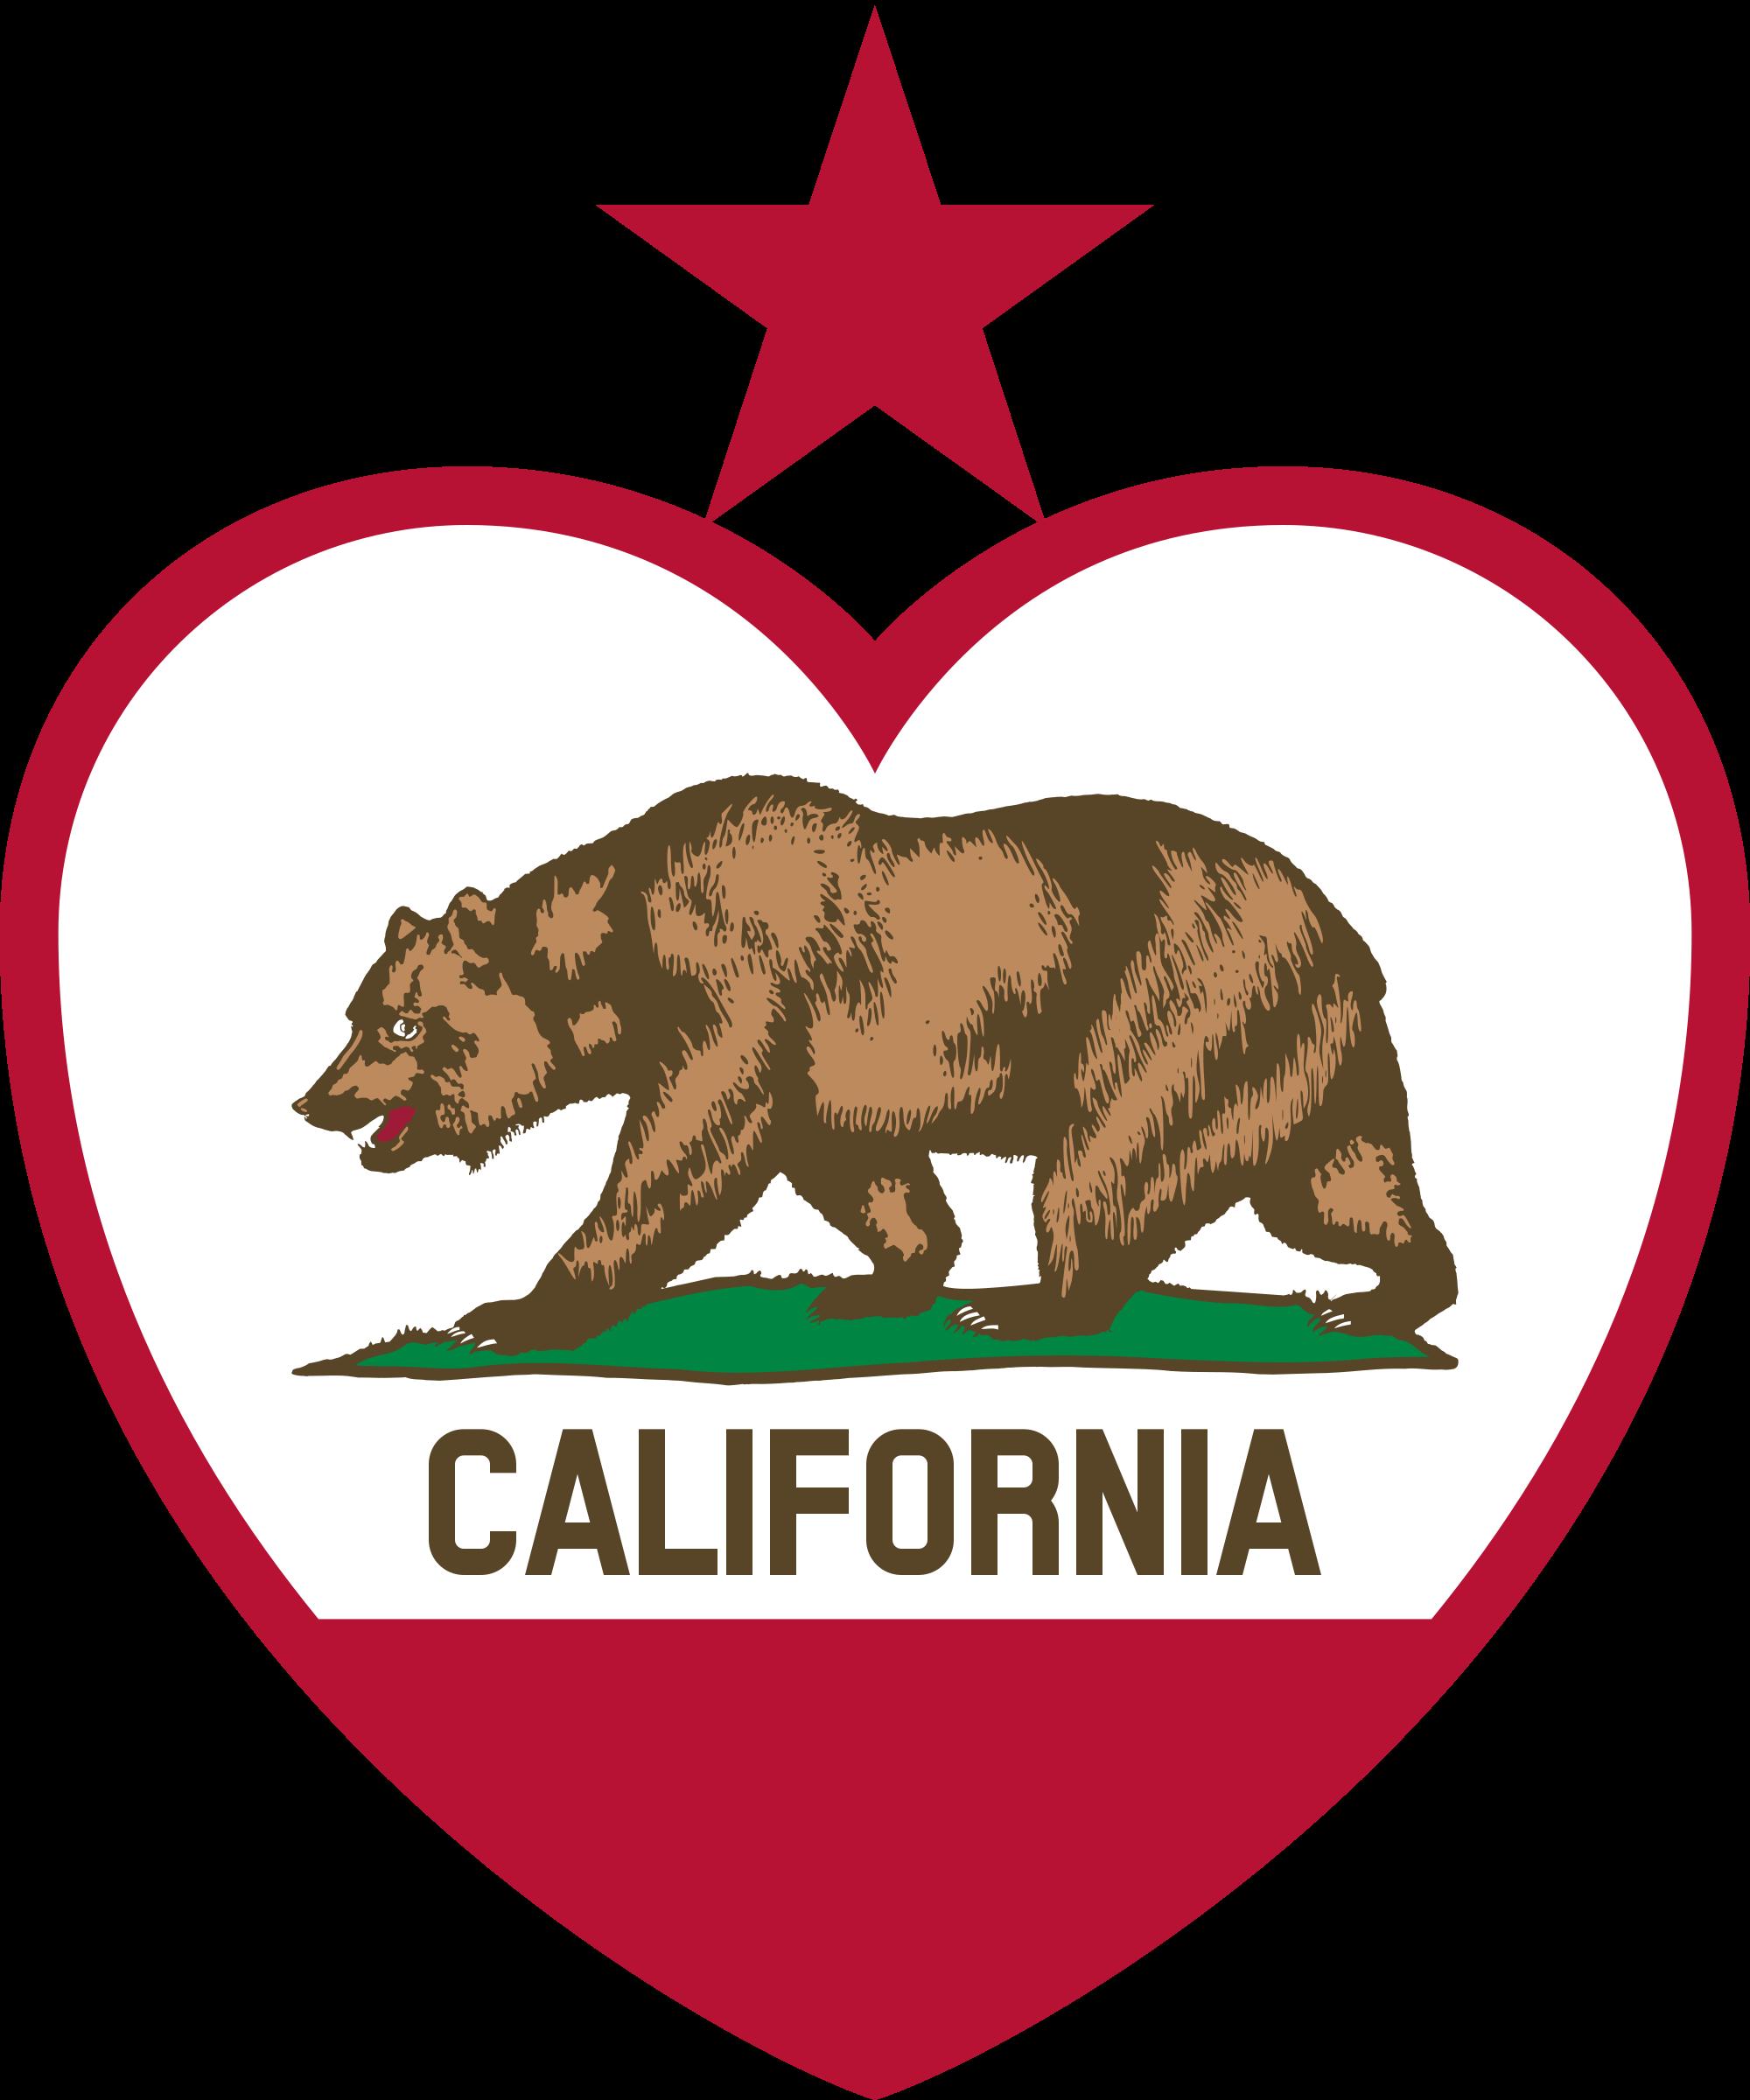 Hearts clipart bear. California flag heart star